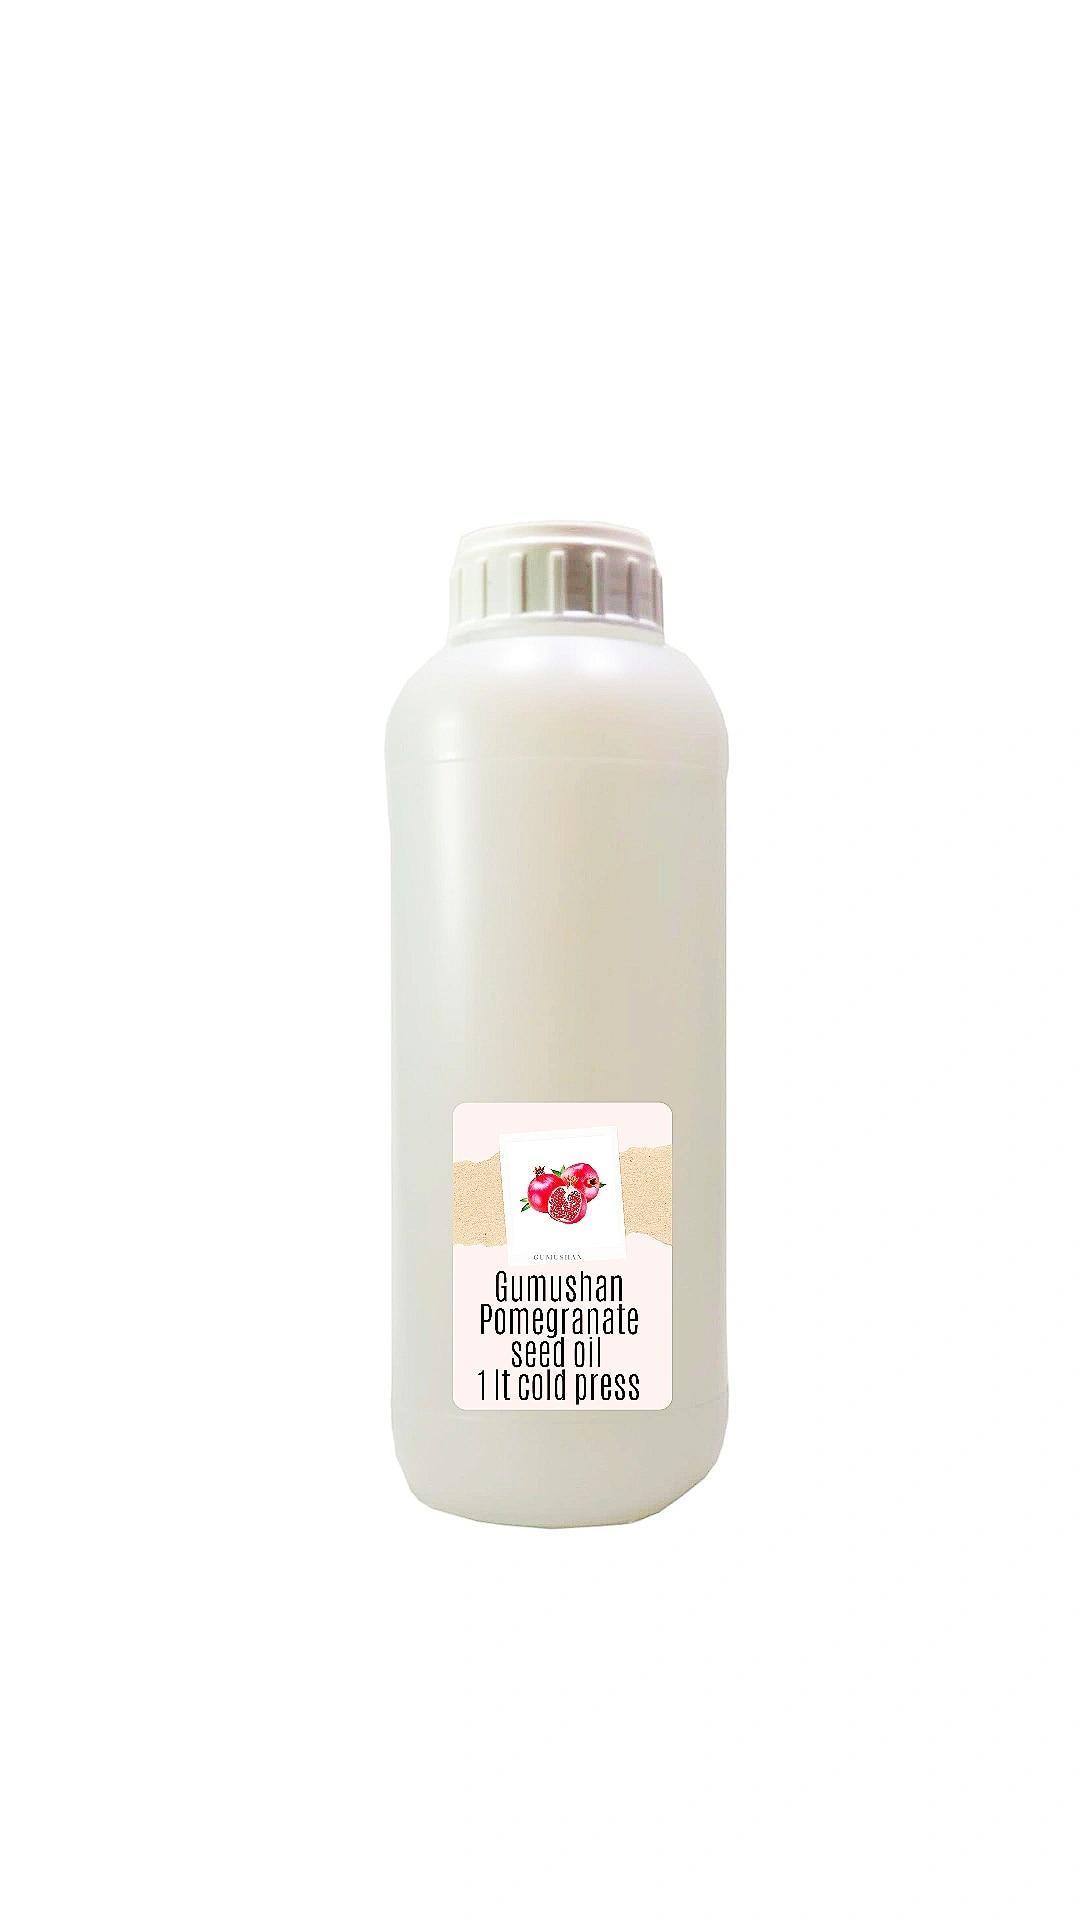 High quality pure Pomegranate Seed Oil 1 liter 34 fl oz 1000ml